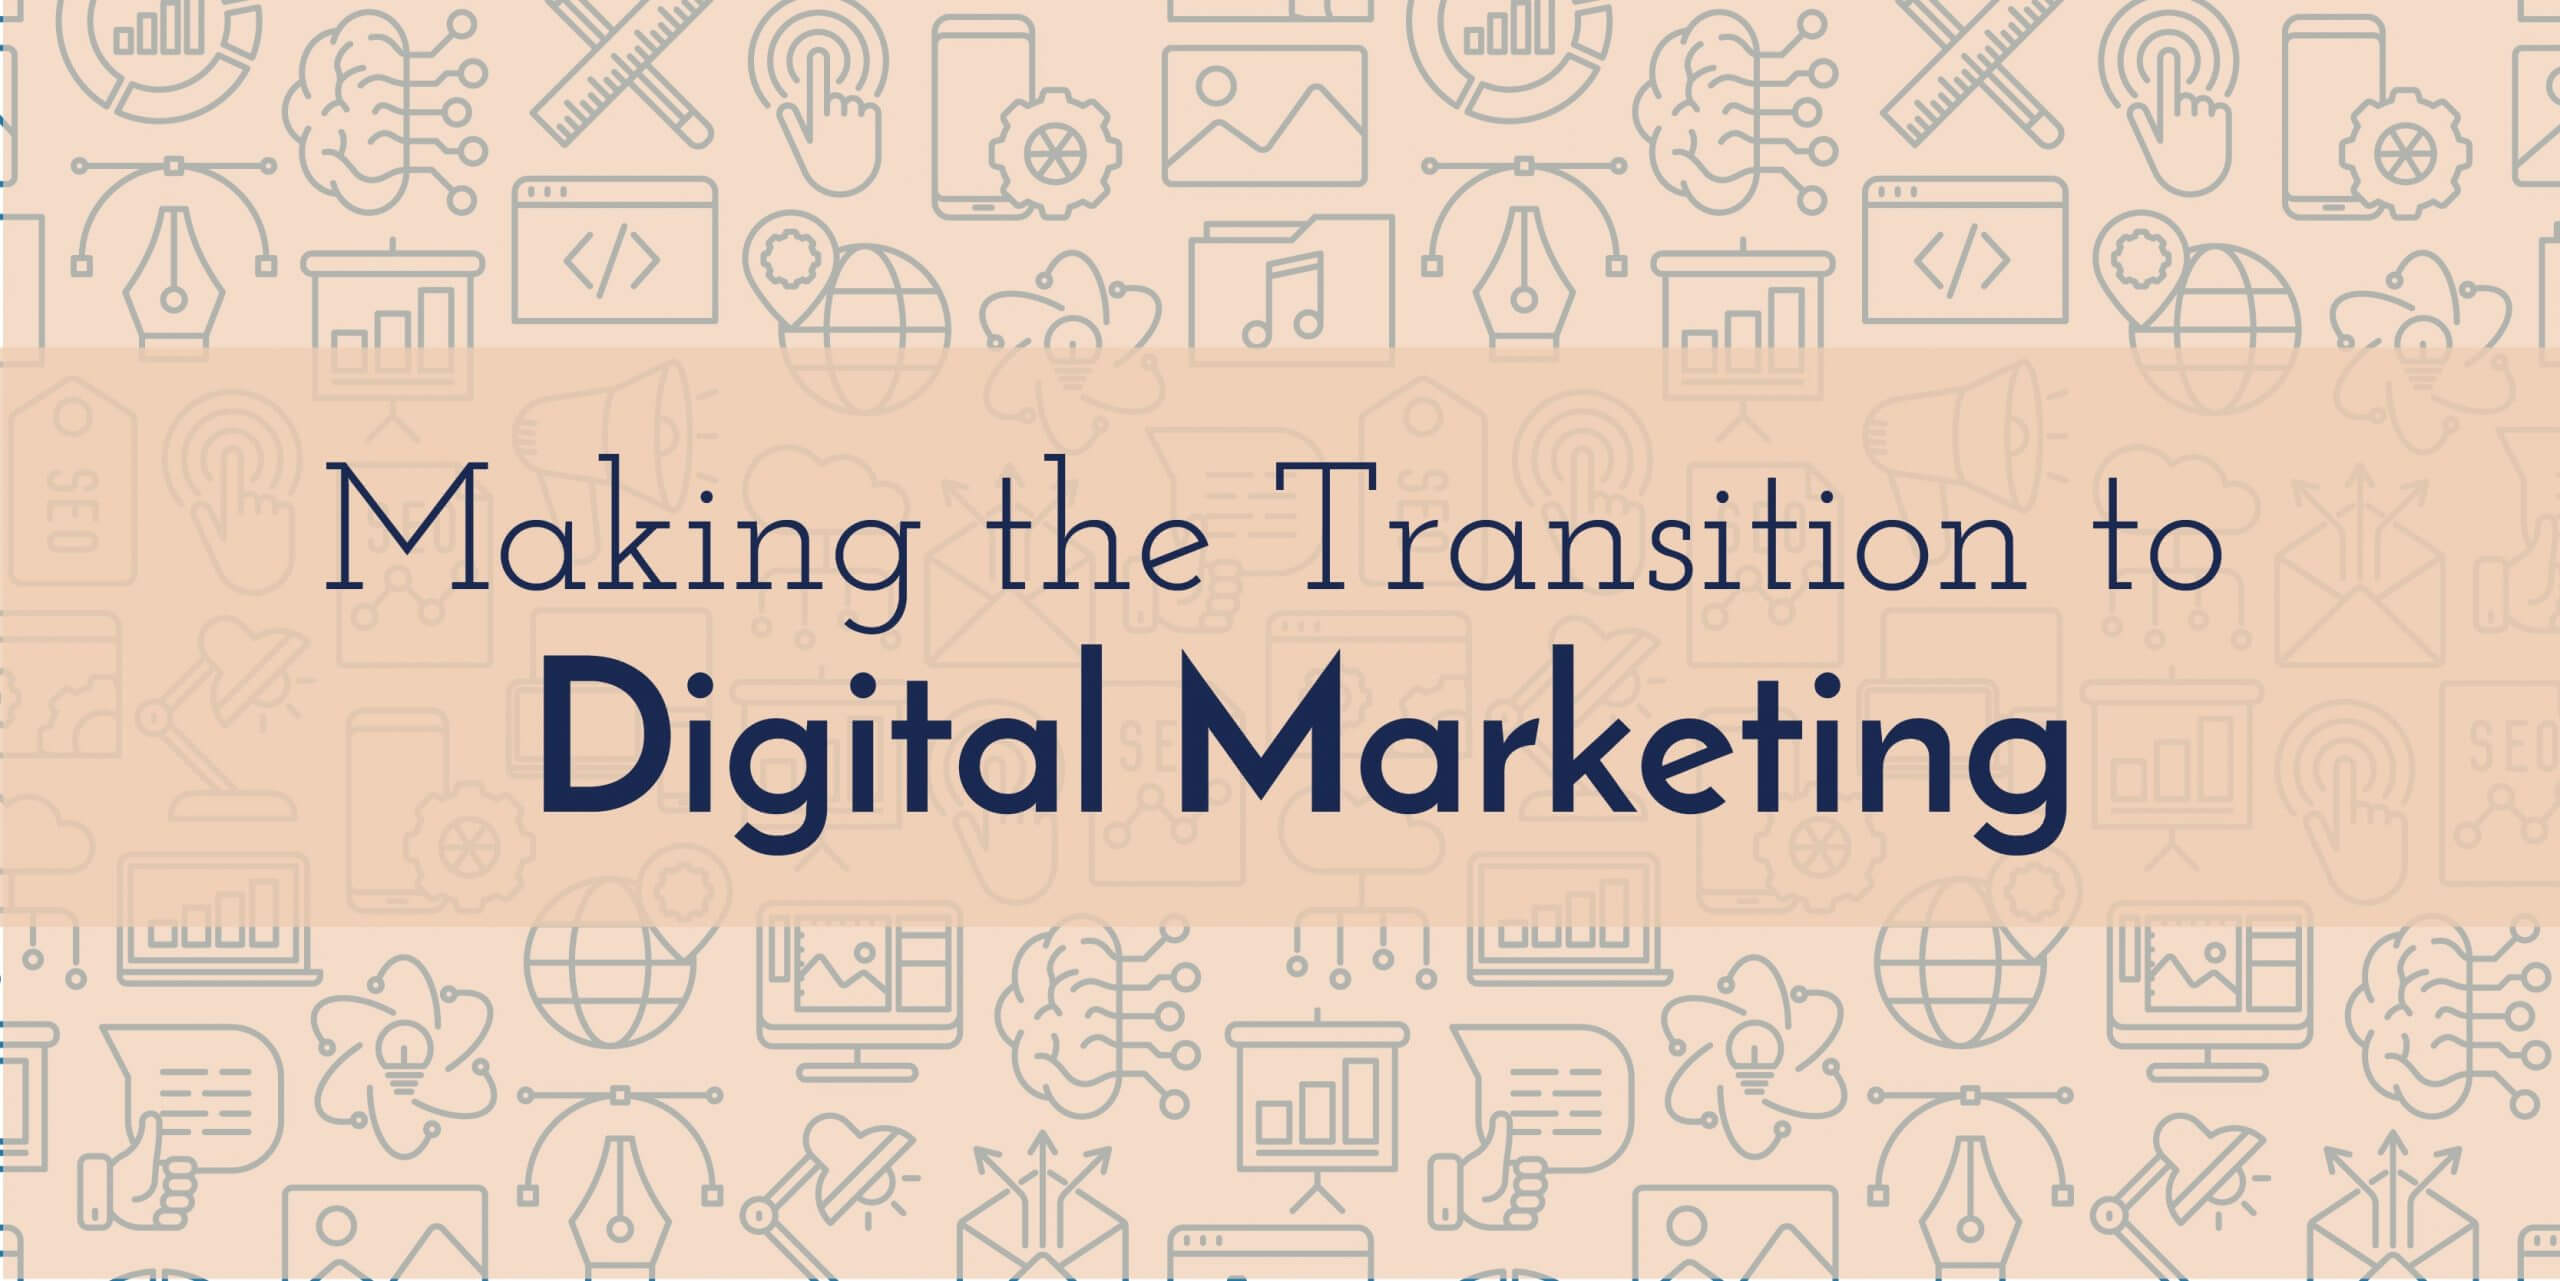 Transition to Digital Marketing